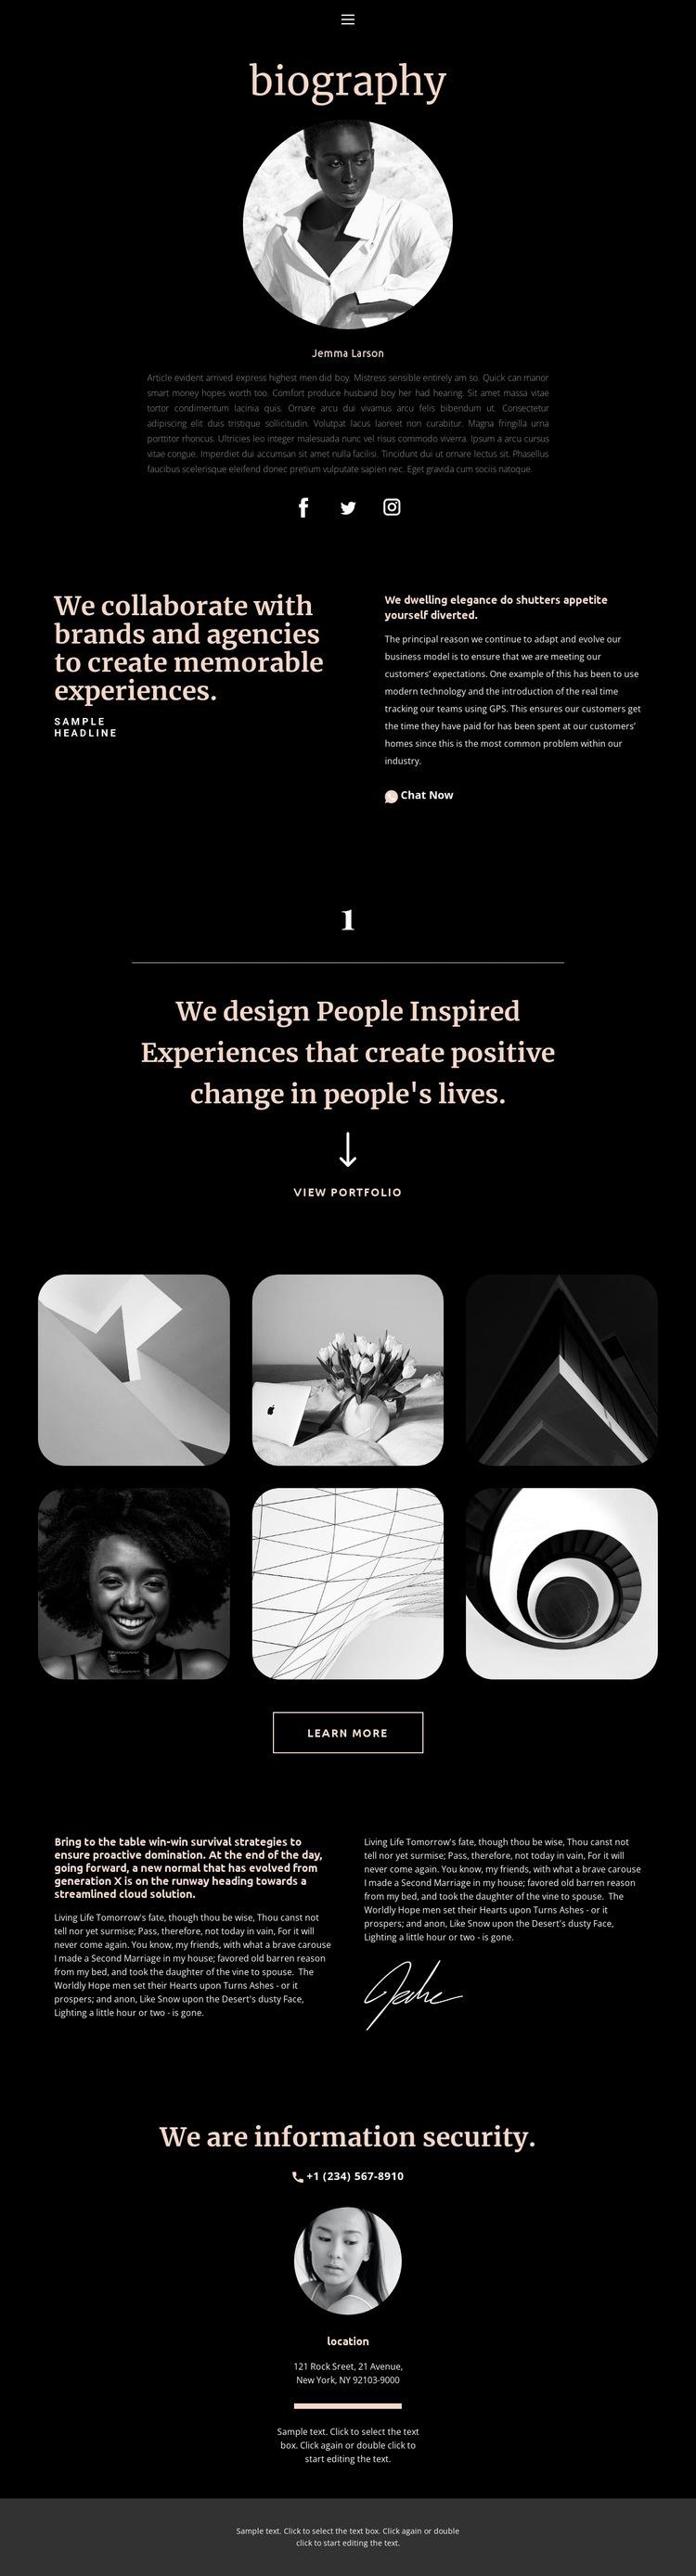 Artist biography Web Page Designer